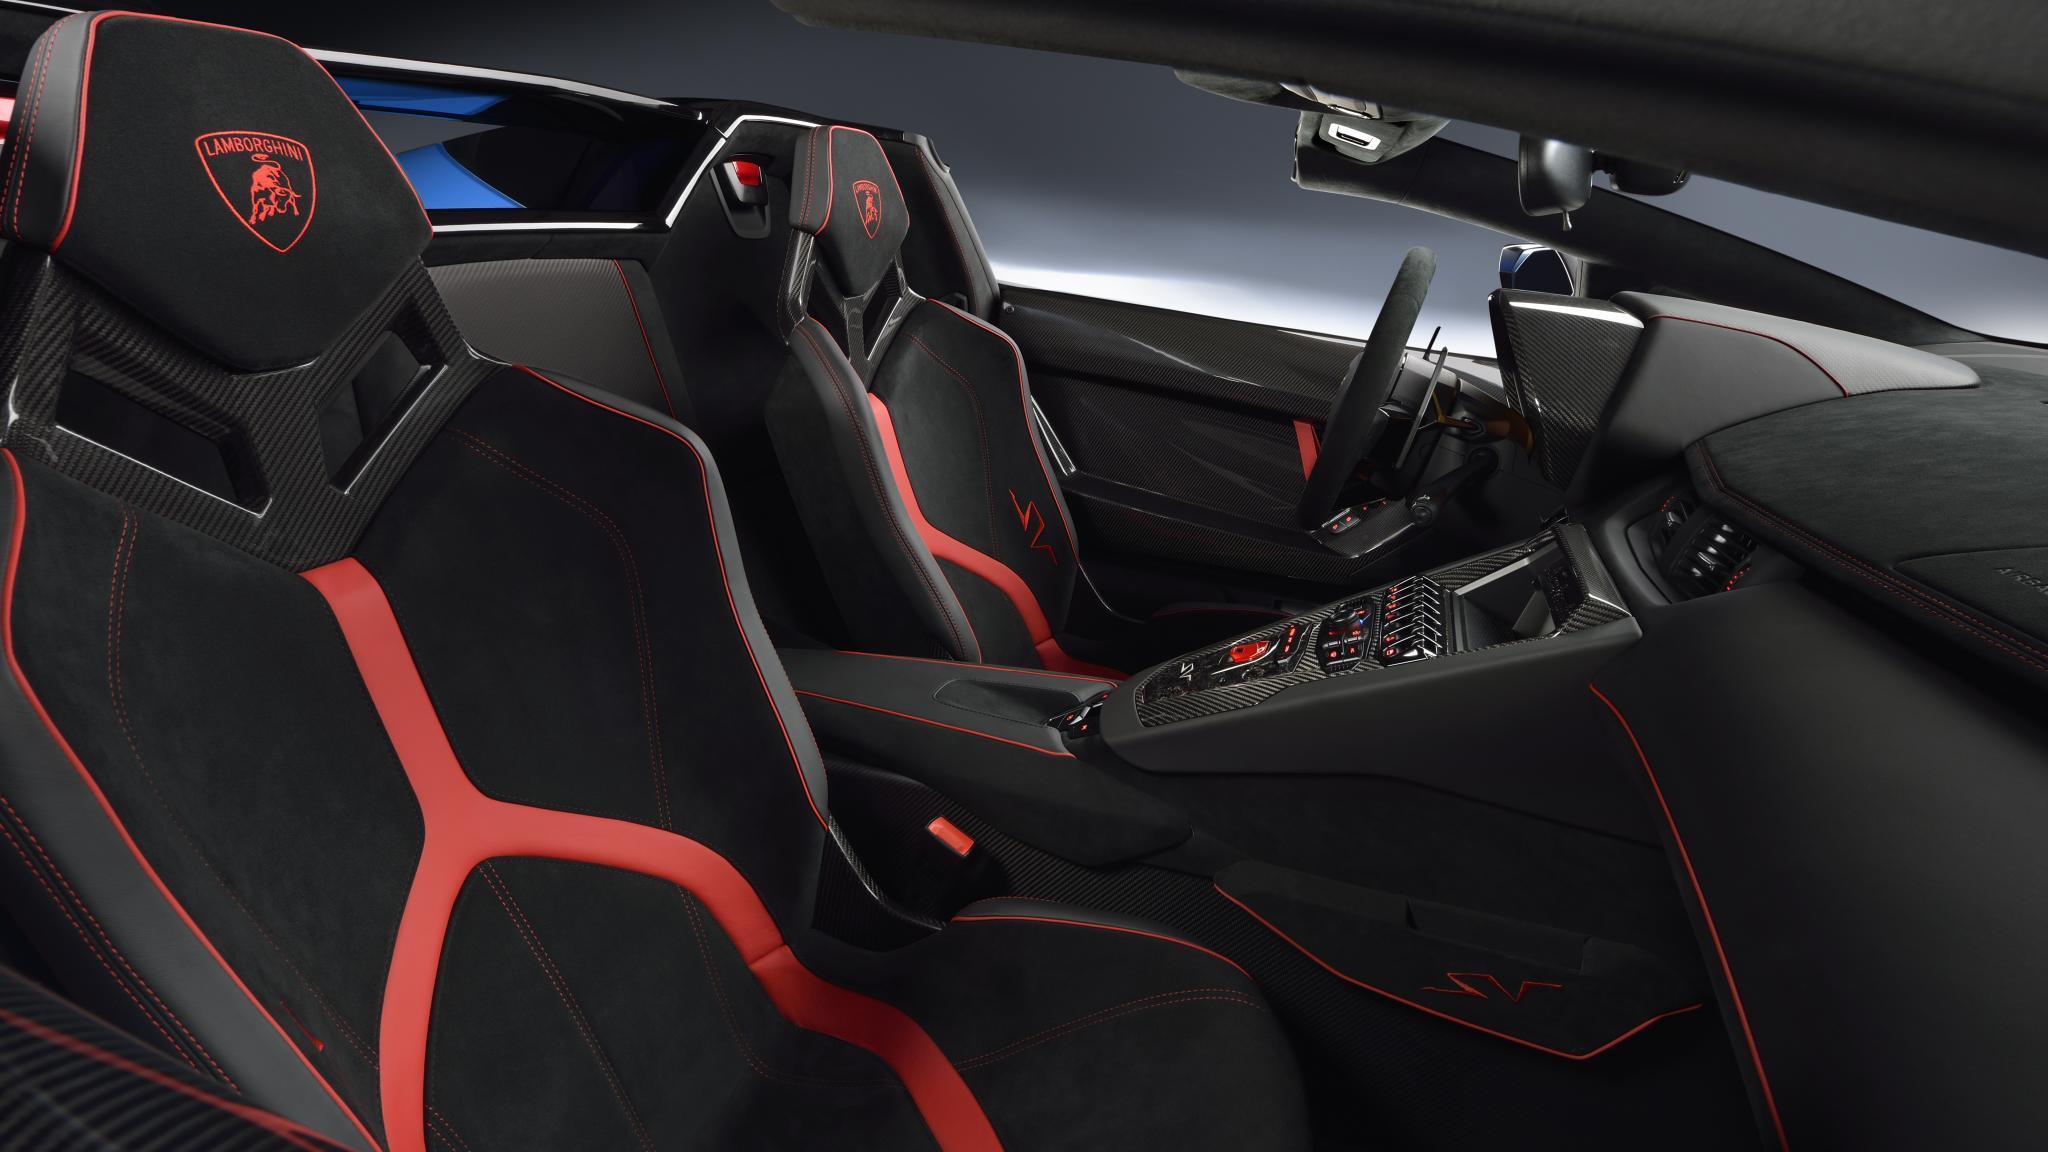 Lamborghini-AventadorSV-Roadster-5